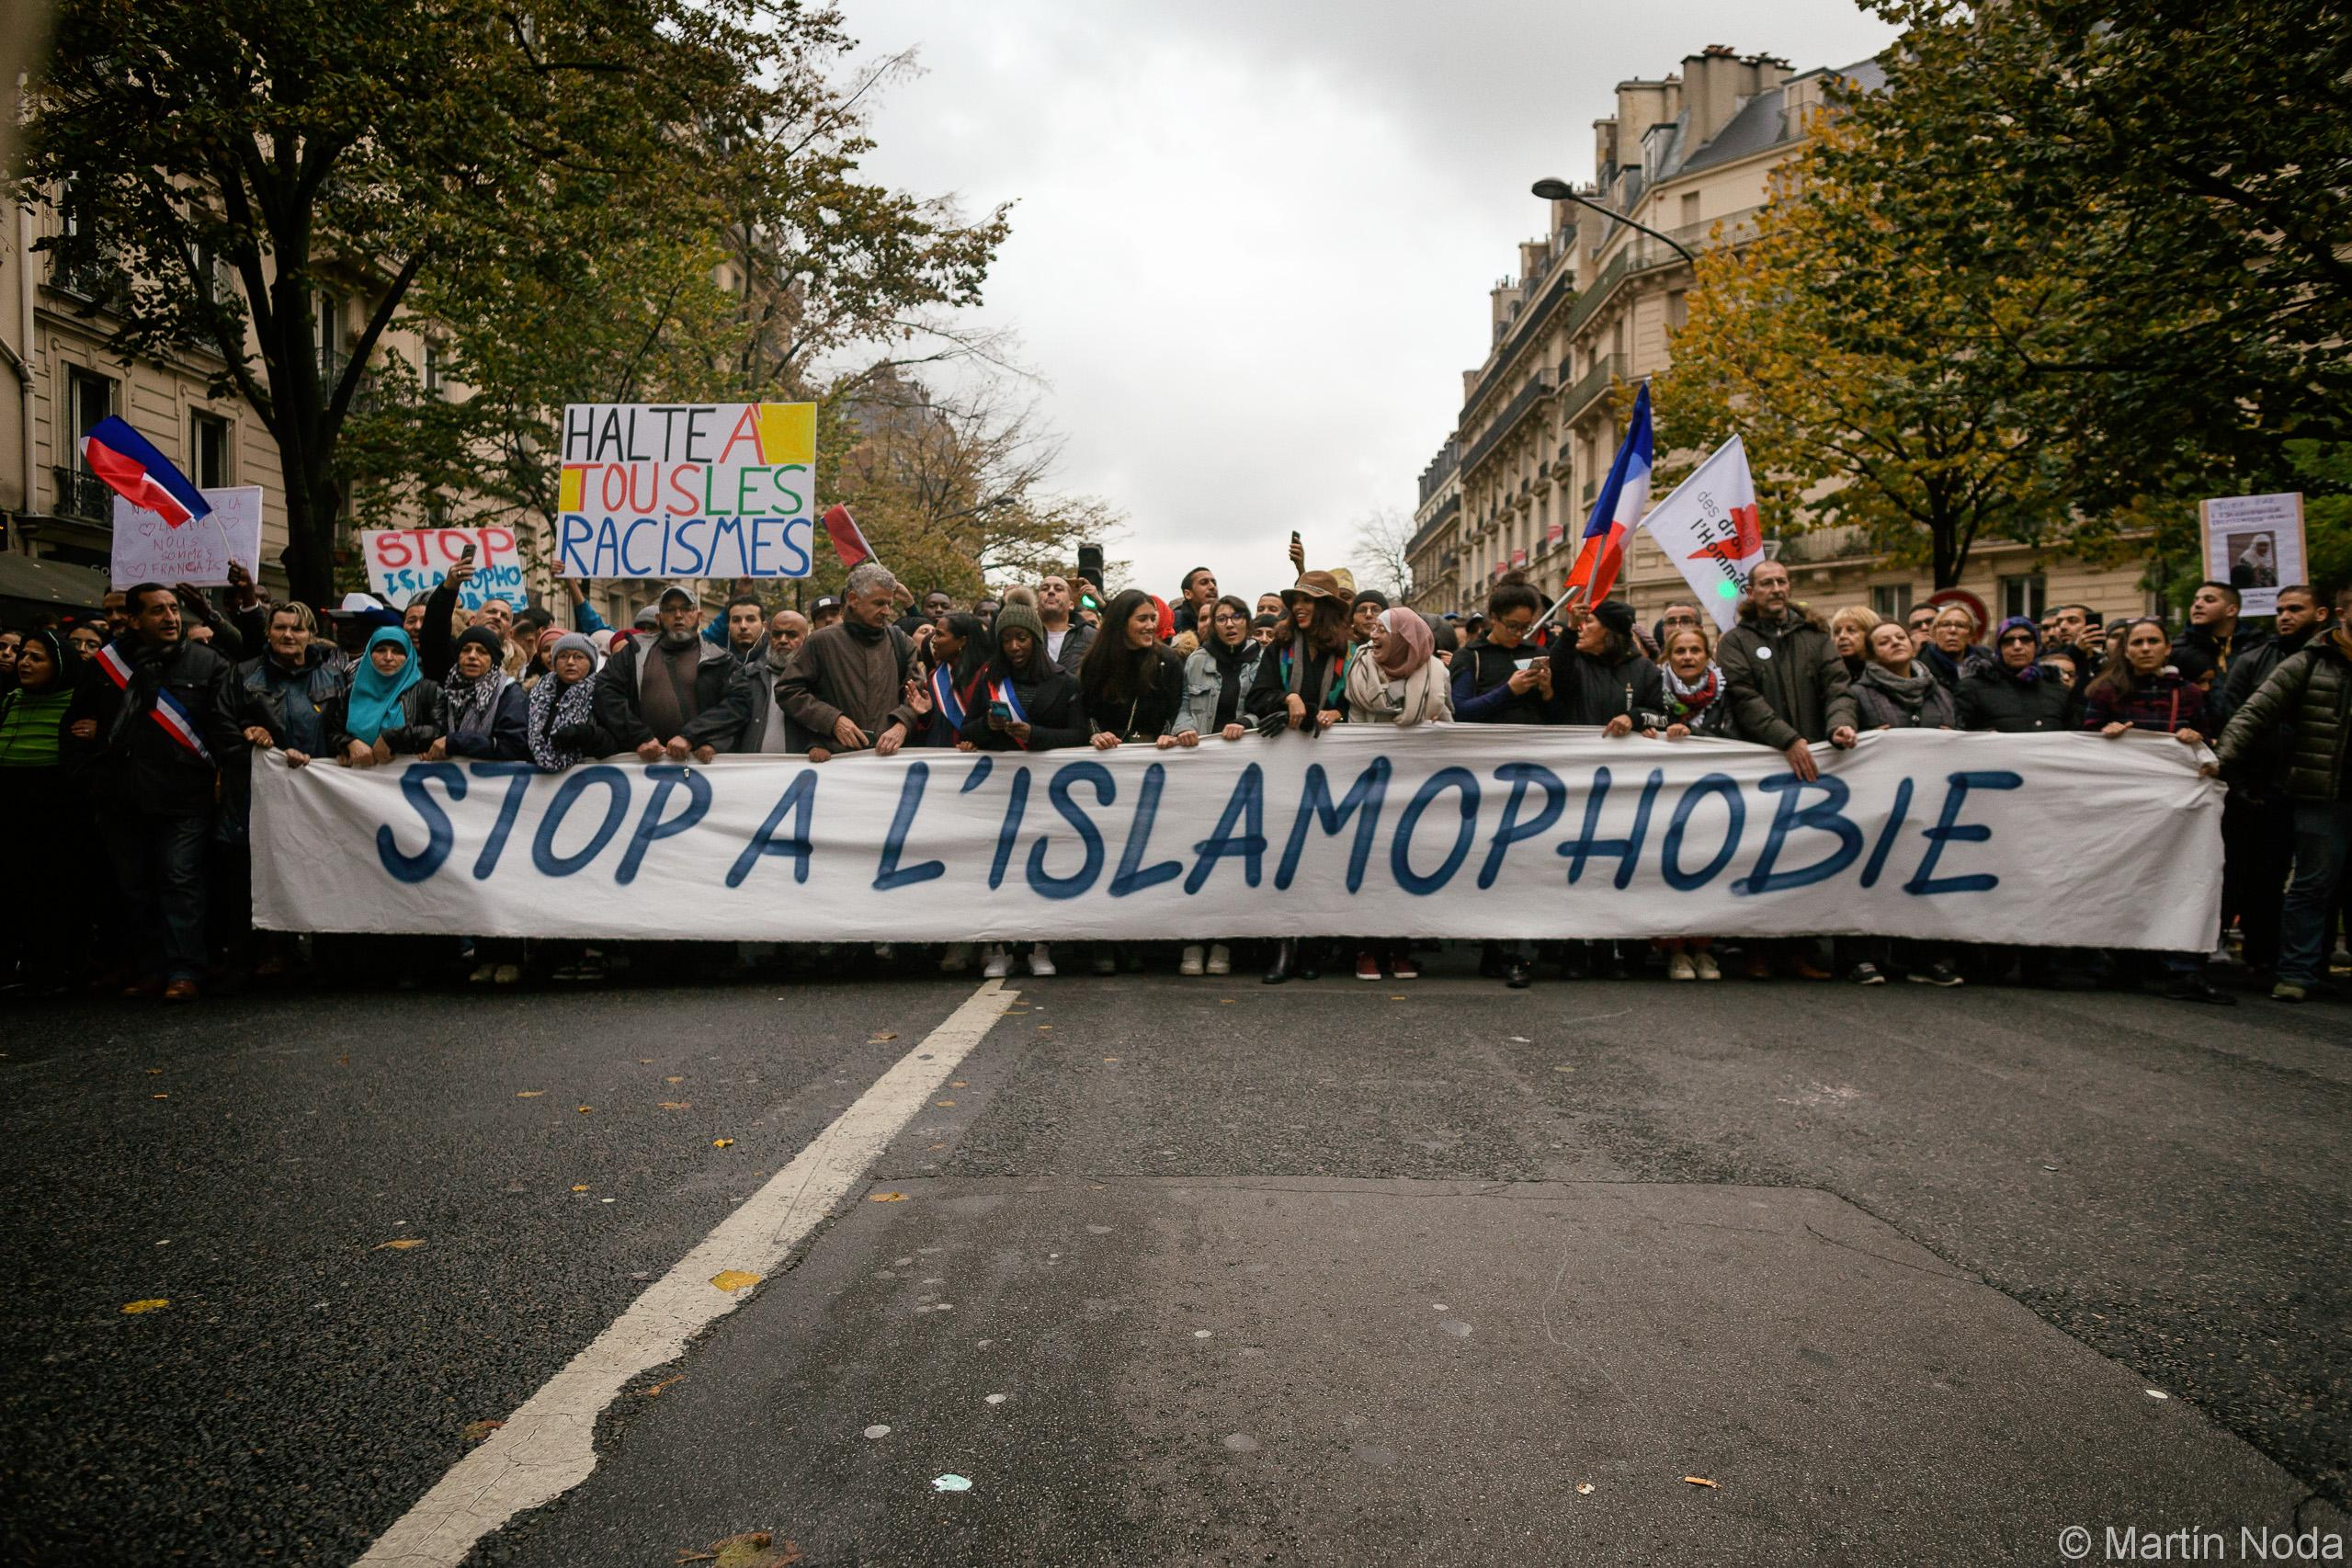 Manifestation contre l'islamophobie. 10/11/2019.